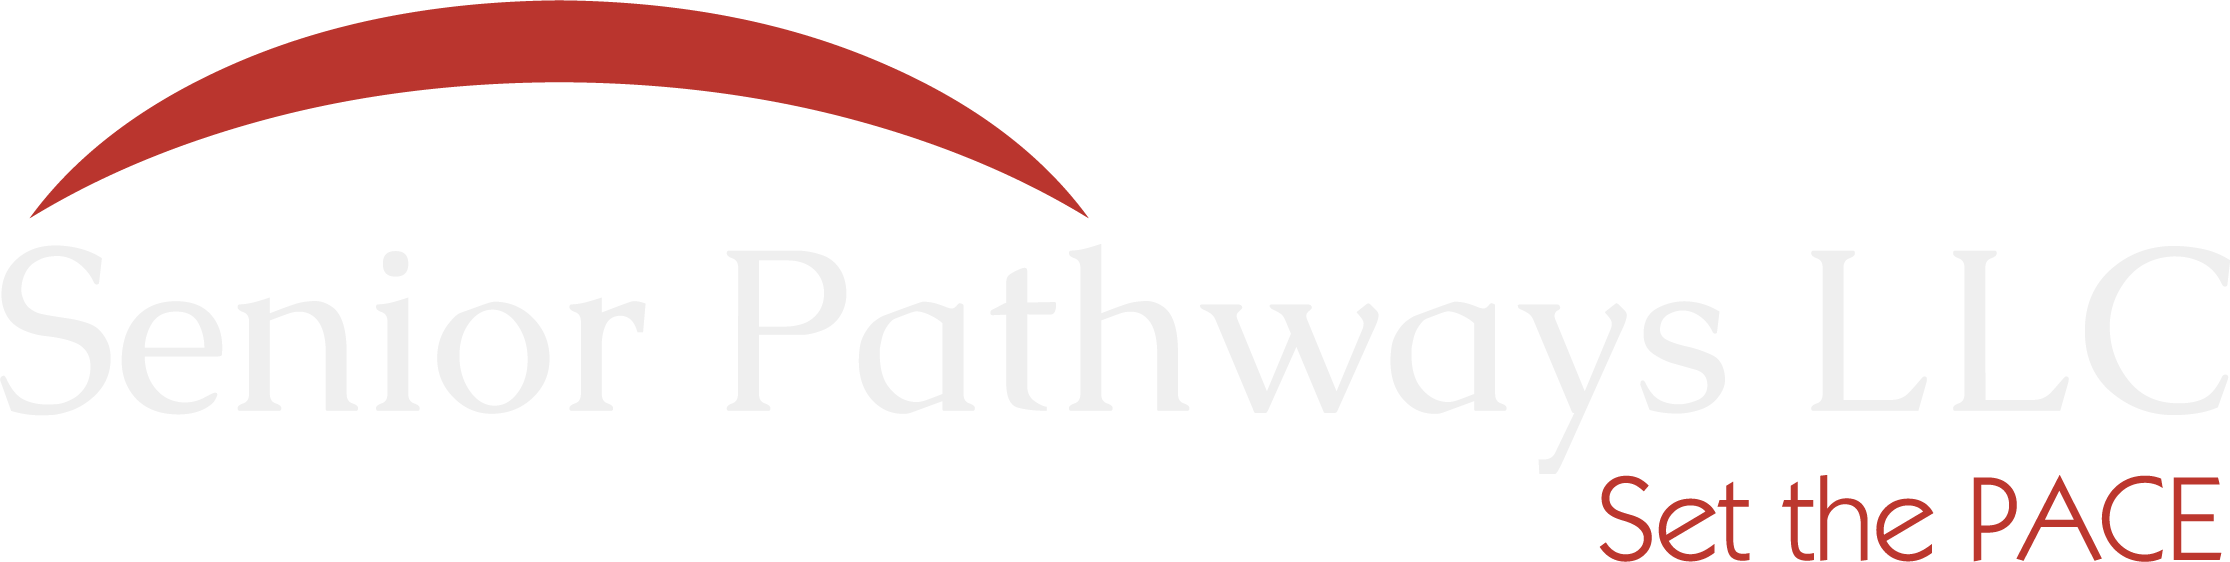 Senior Pathways